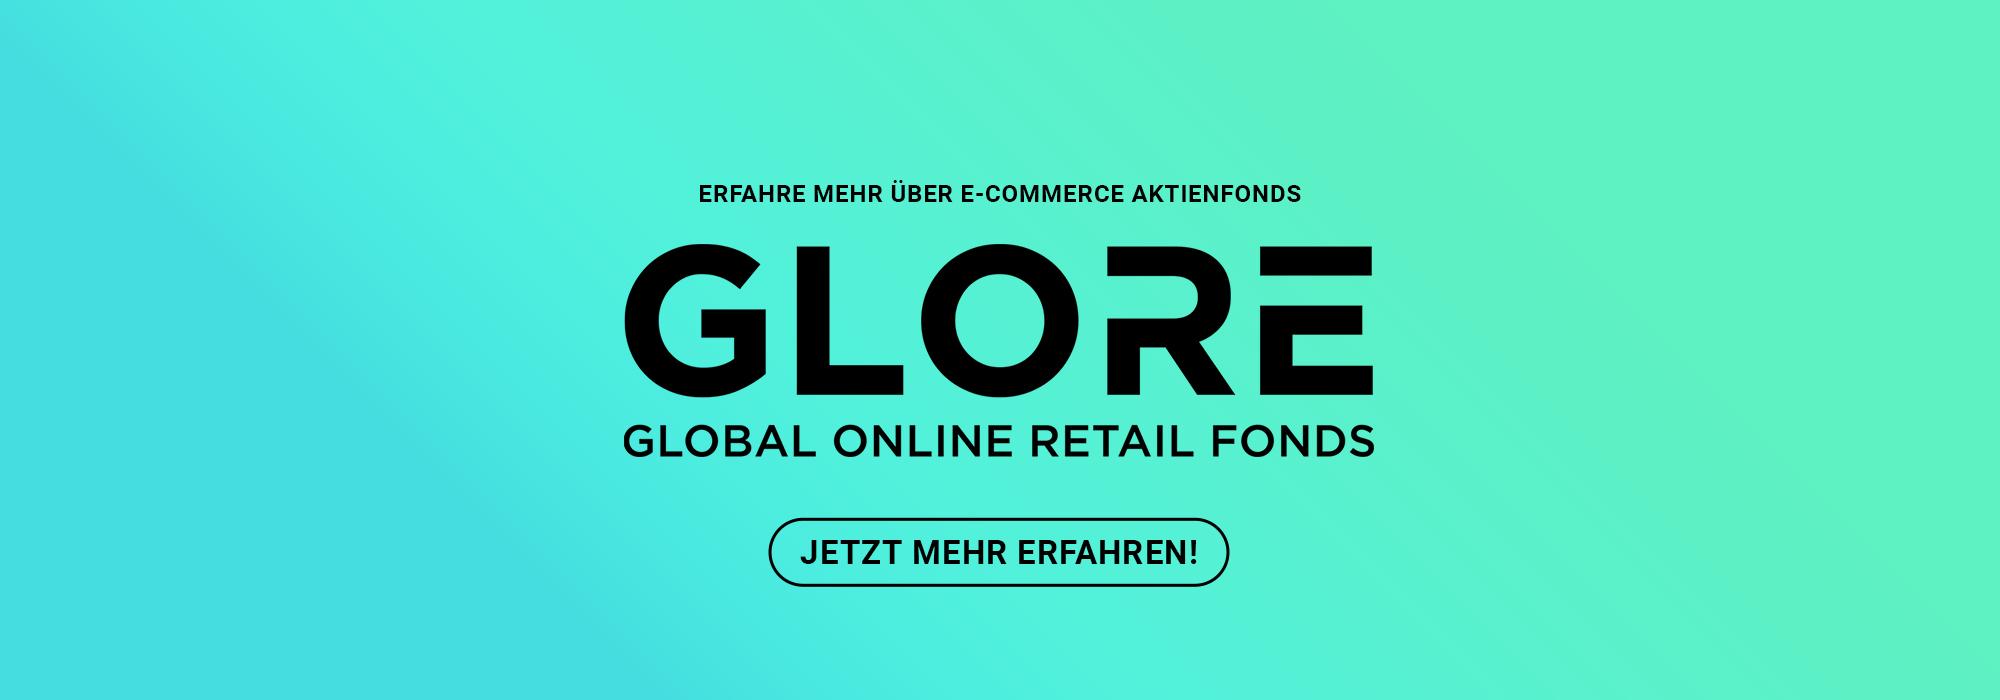 Glore Future Retail Fond - Zur Website